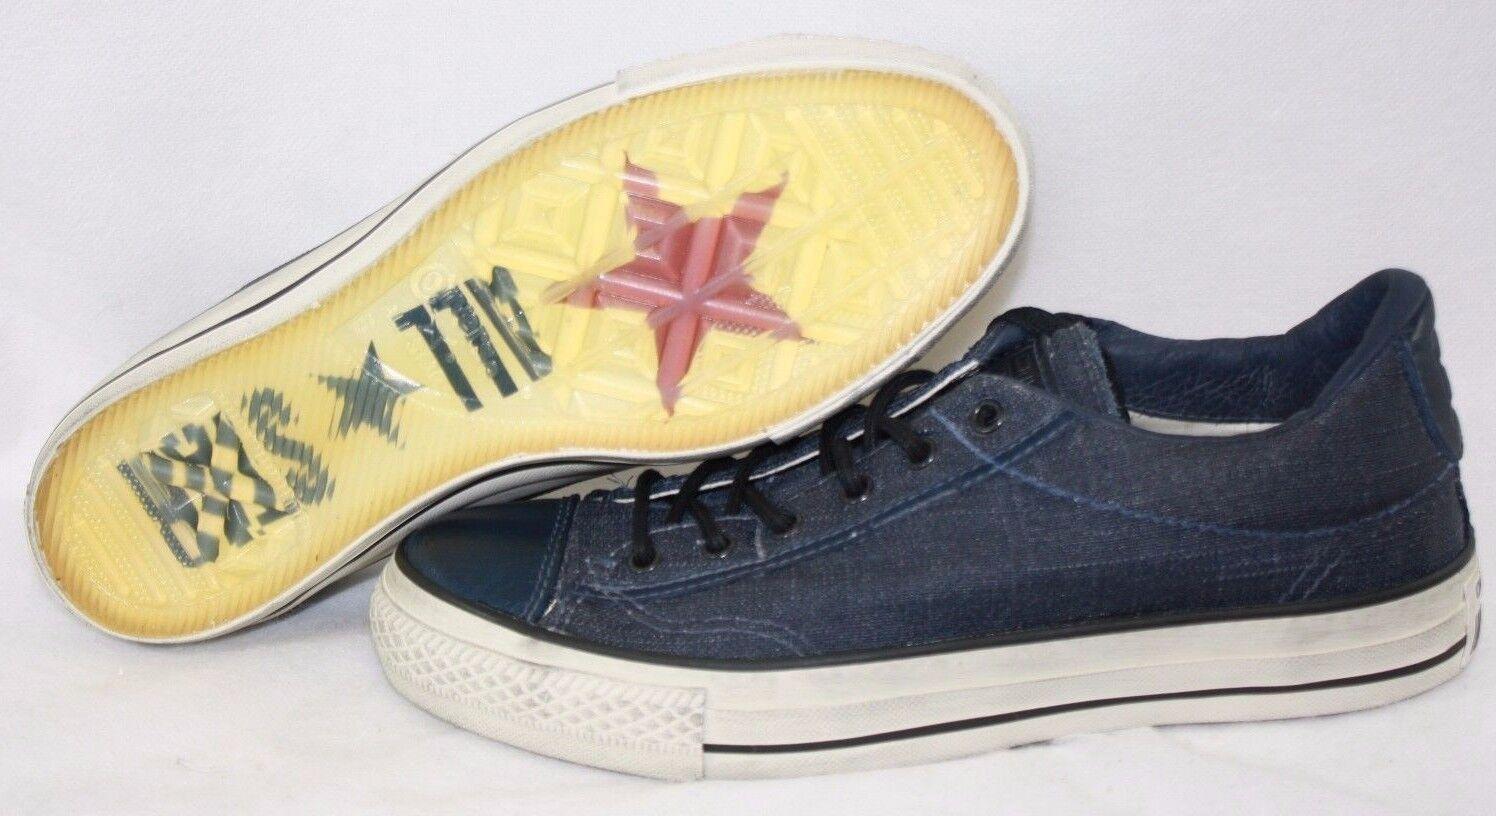 NEW Mens CONVERSE 150181C John Varvatos All Star CT Vintage Slip Sneakers Shoes